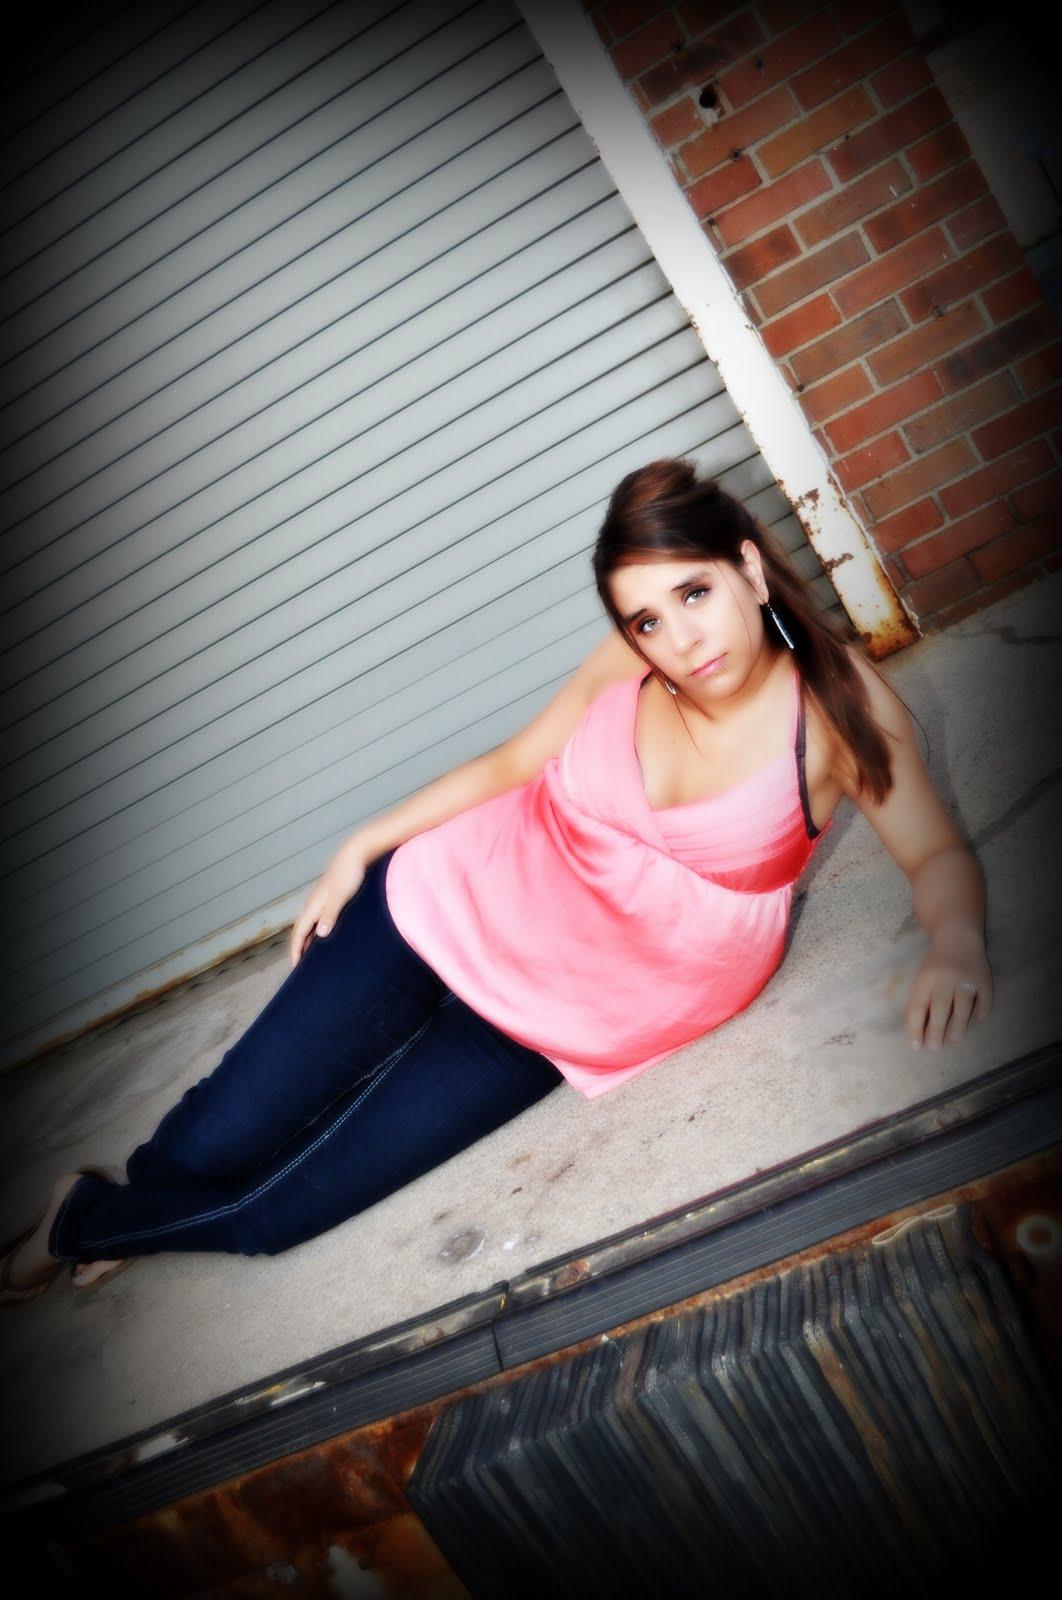 http://1.bp.blogspot.com/_qNMNRPbpac0/S_XcEn7XBbI/AAAAAAAAAgY/-2in09hMN6s/s1600/DSC_0021vignette.jpg